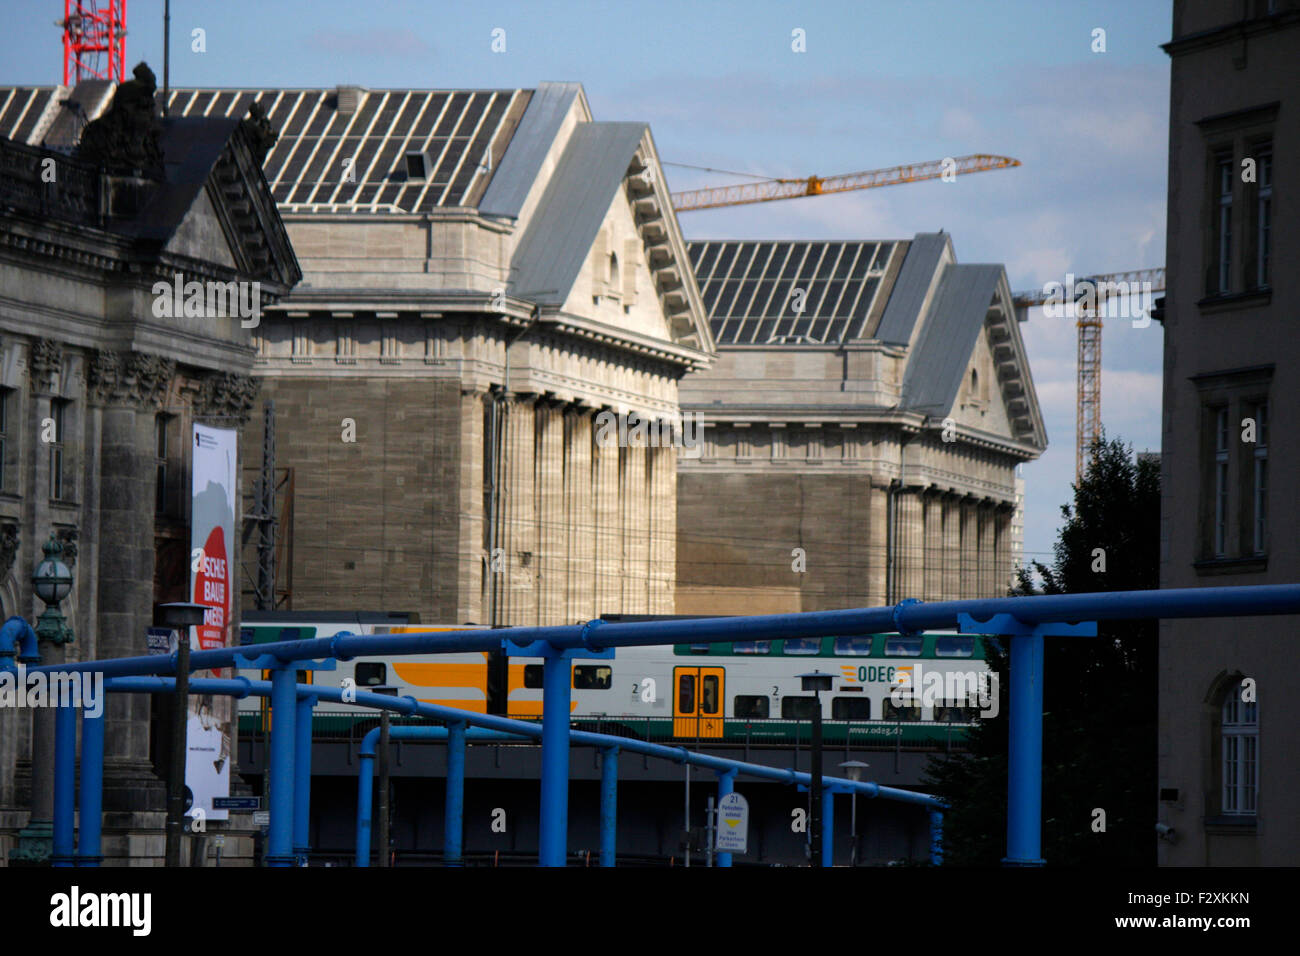 Pergamon Museum, Museumsinsel, Berlin-Mitte. - Stock Image